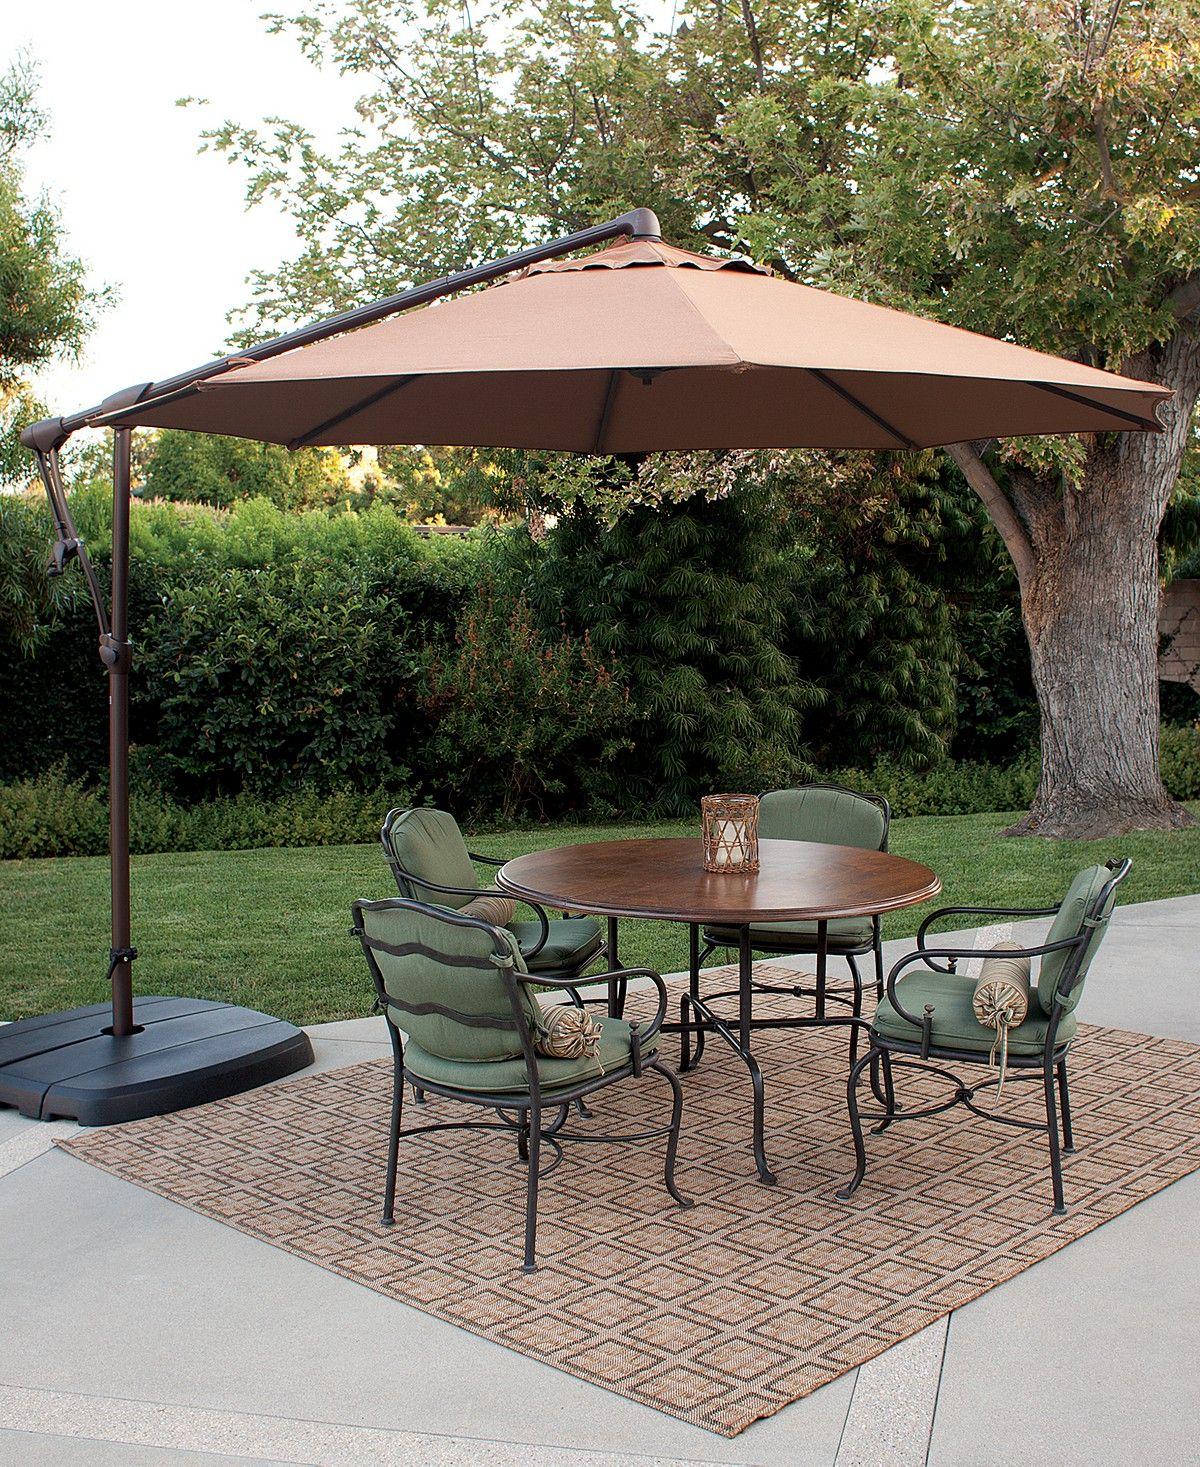 Park Art|My WordPress Blog_Treasure Garden Patio Umbrella Reviews